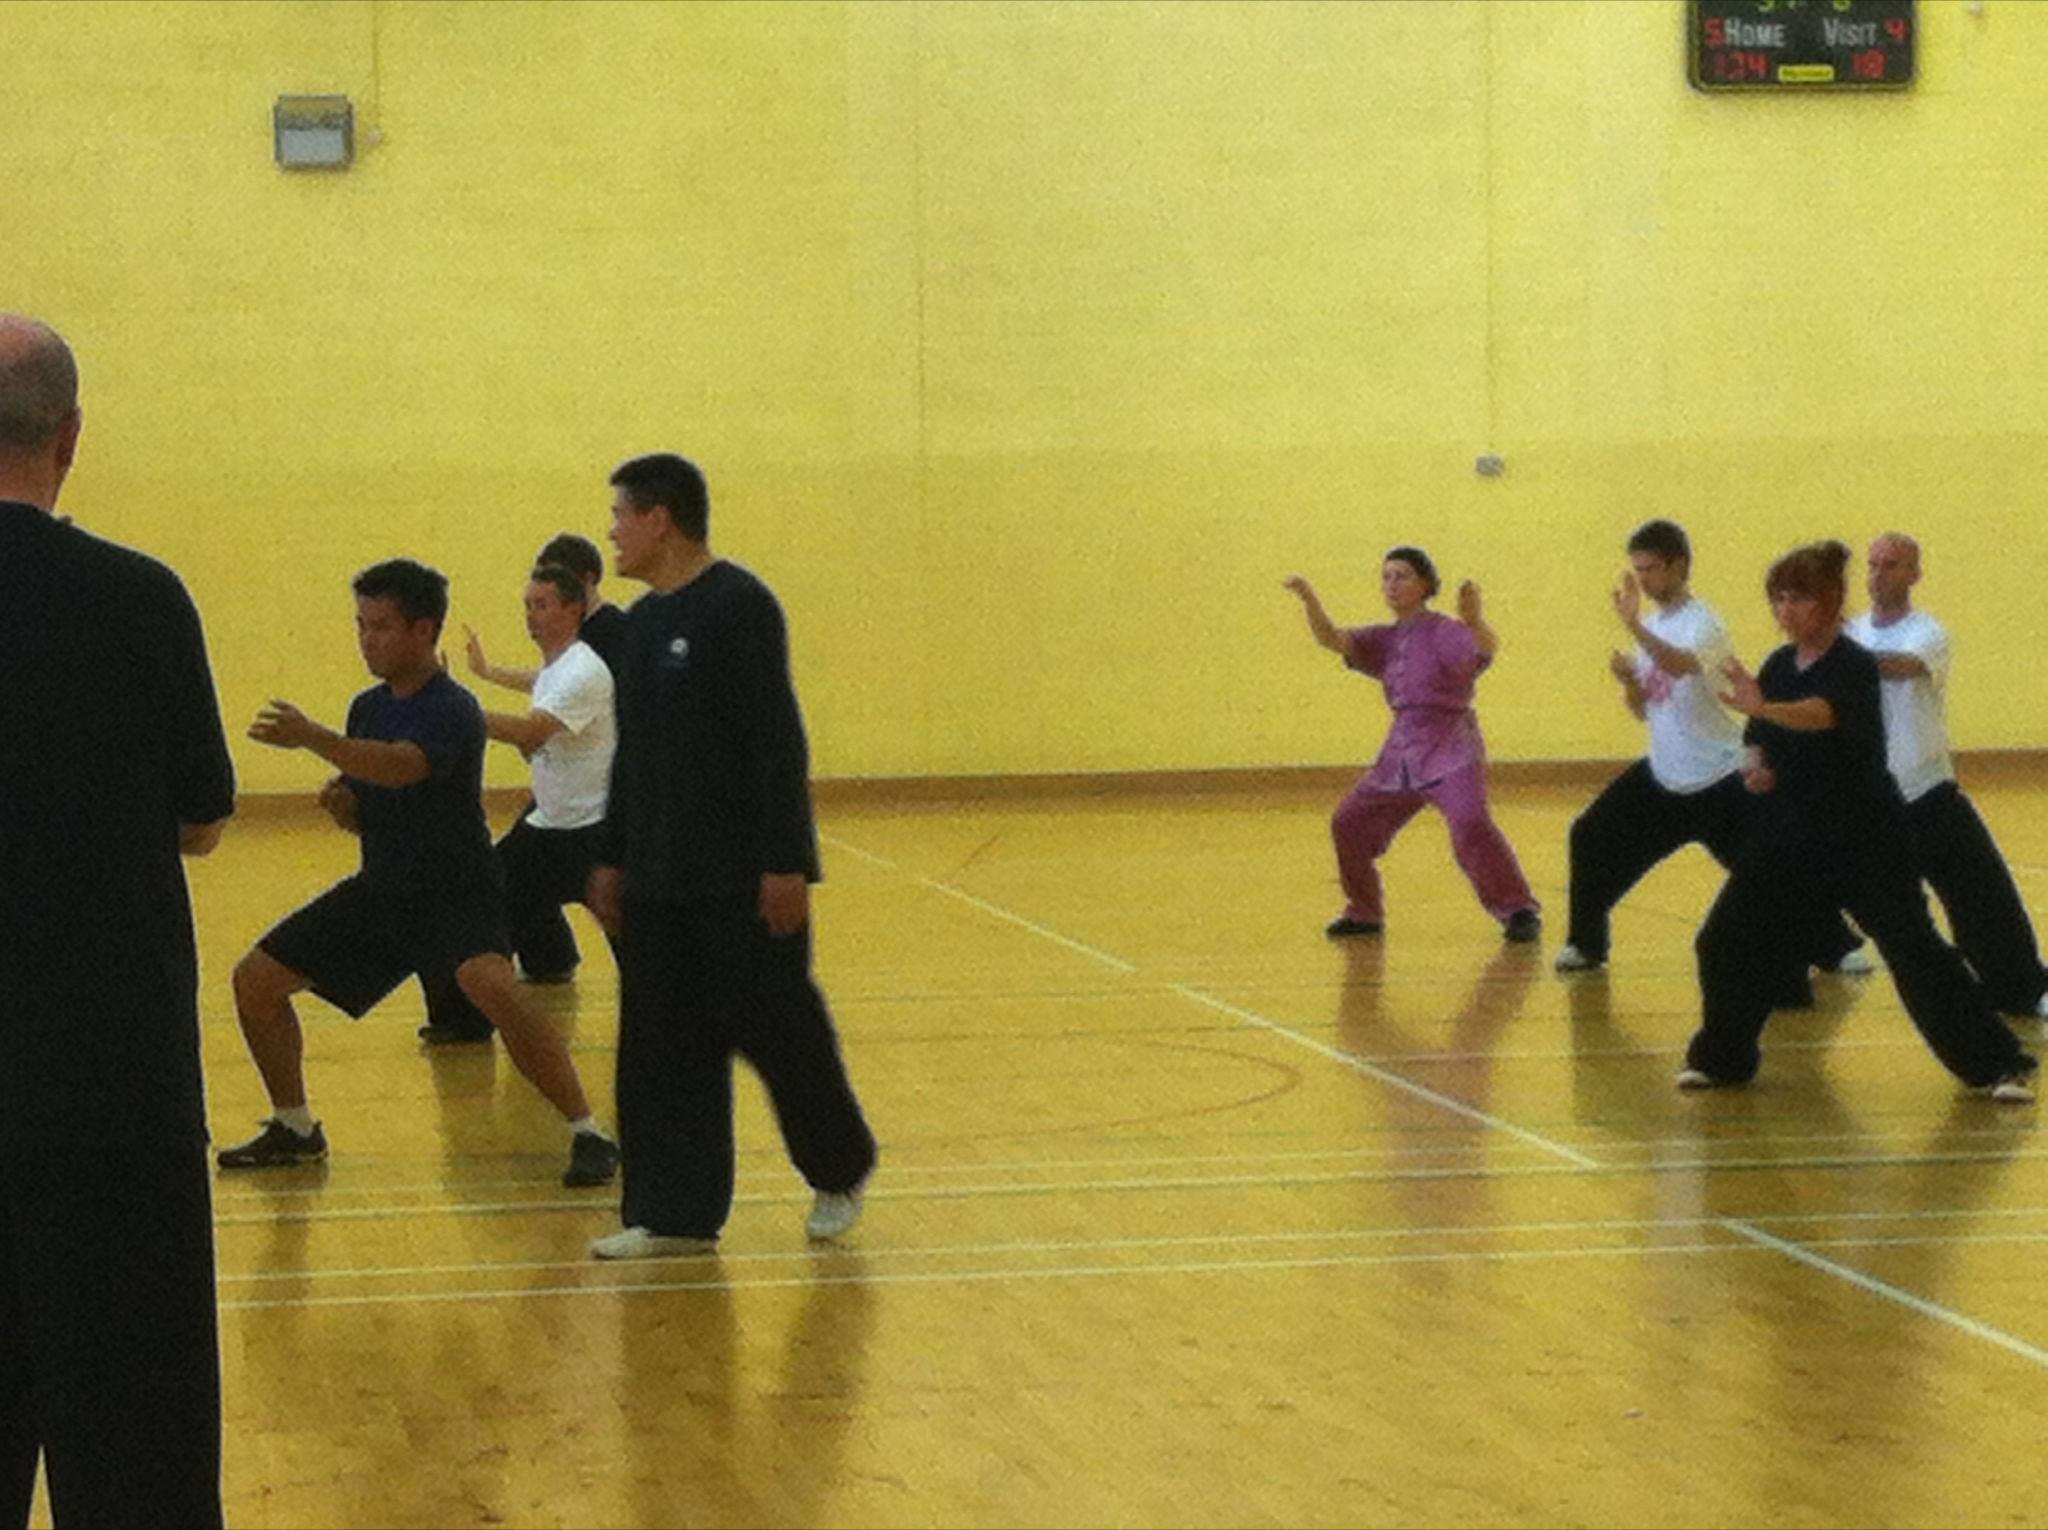 Training in Ireland 2014